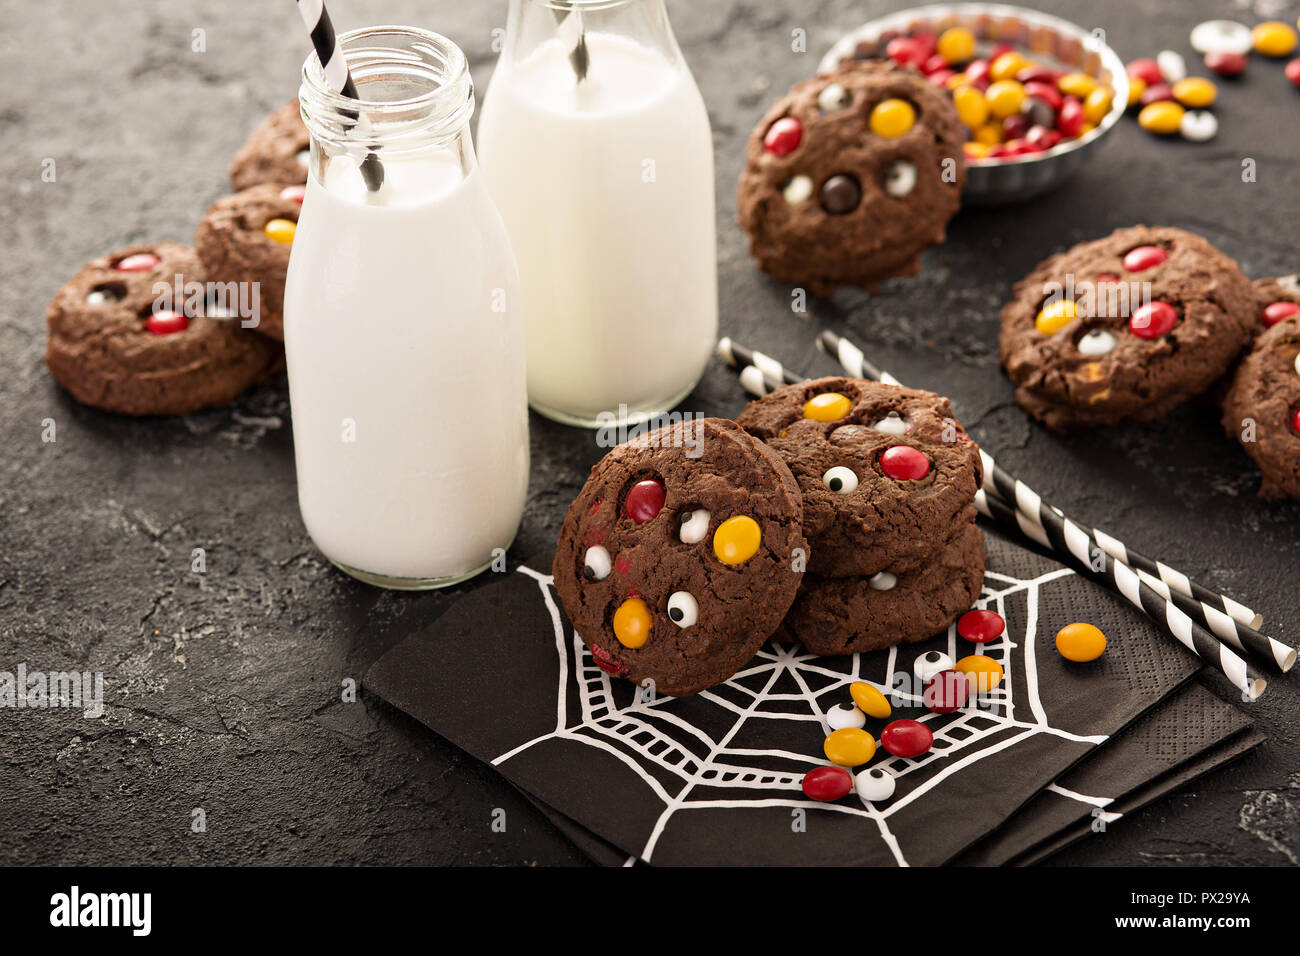 Galletas de chocolate con azúcar y dulces ojos con leche para Halloween Imagen De Stock